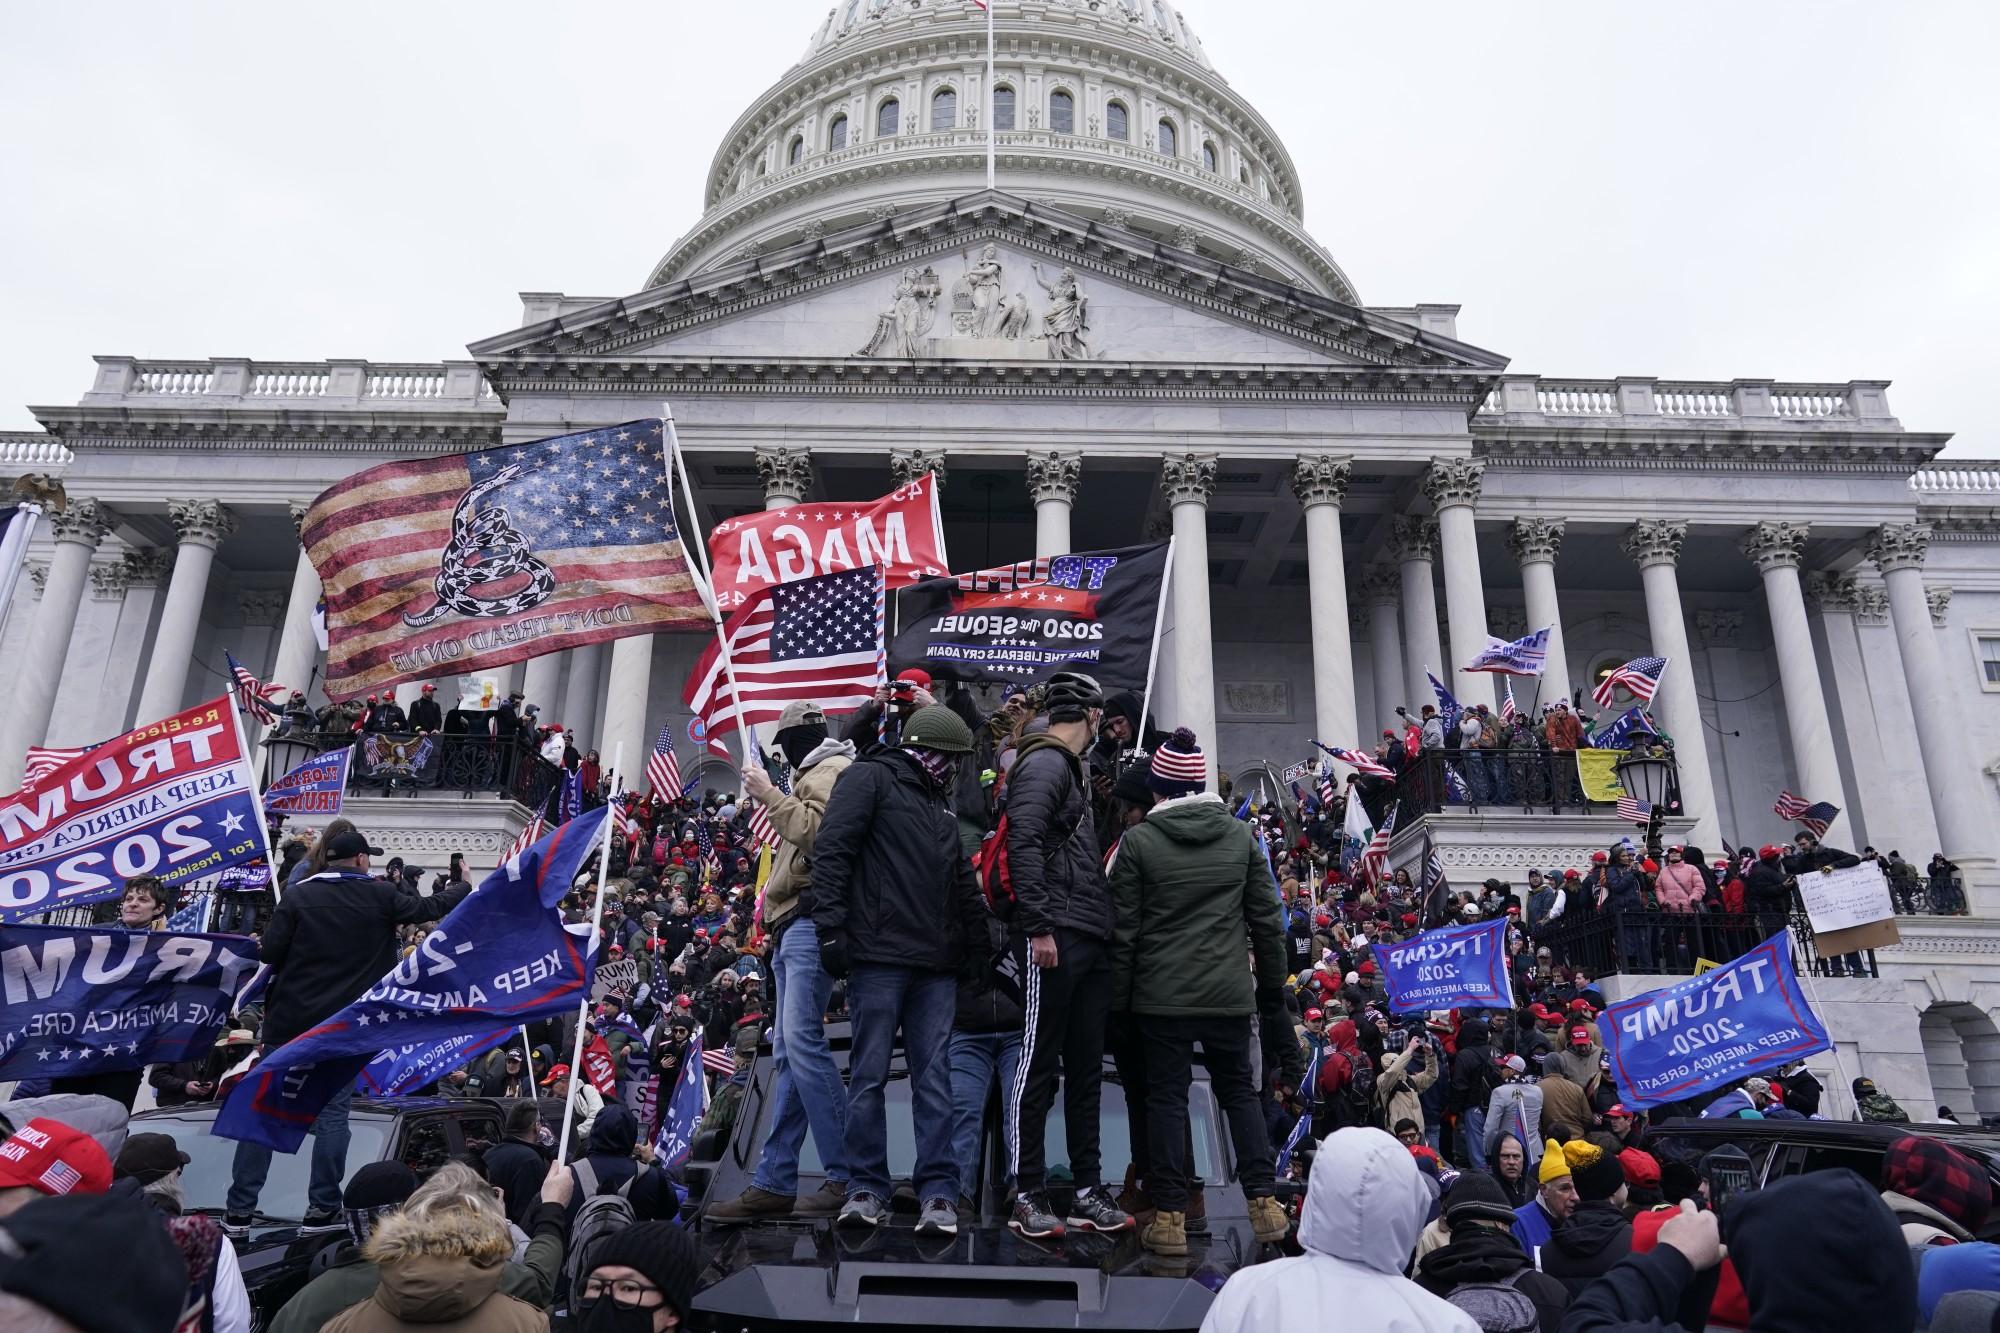 False Flag in DC to demonize Patriots